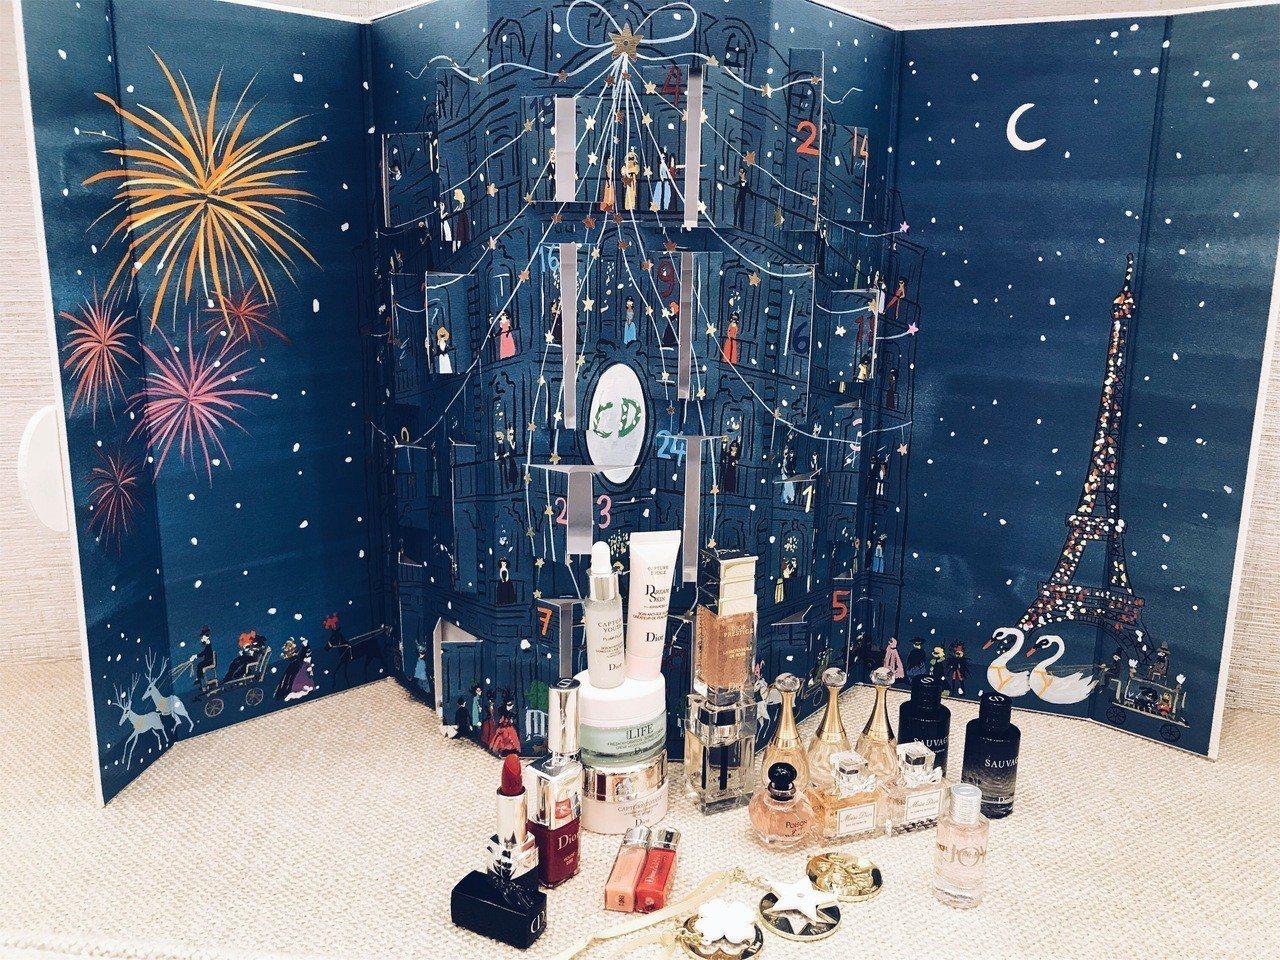 Dior耶誕倒數日曆內含24個人氣經典商品迷你款與造型吊飾,售價12,000元,...